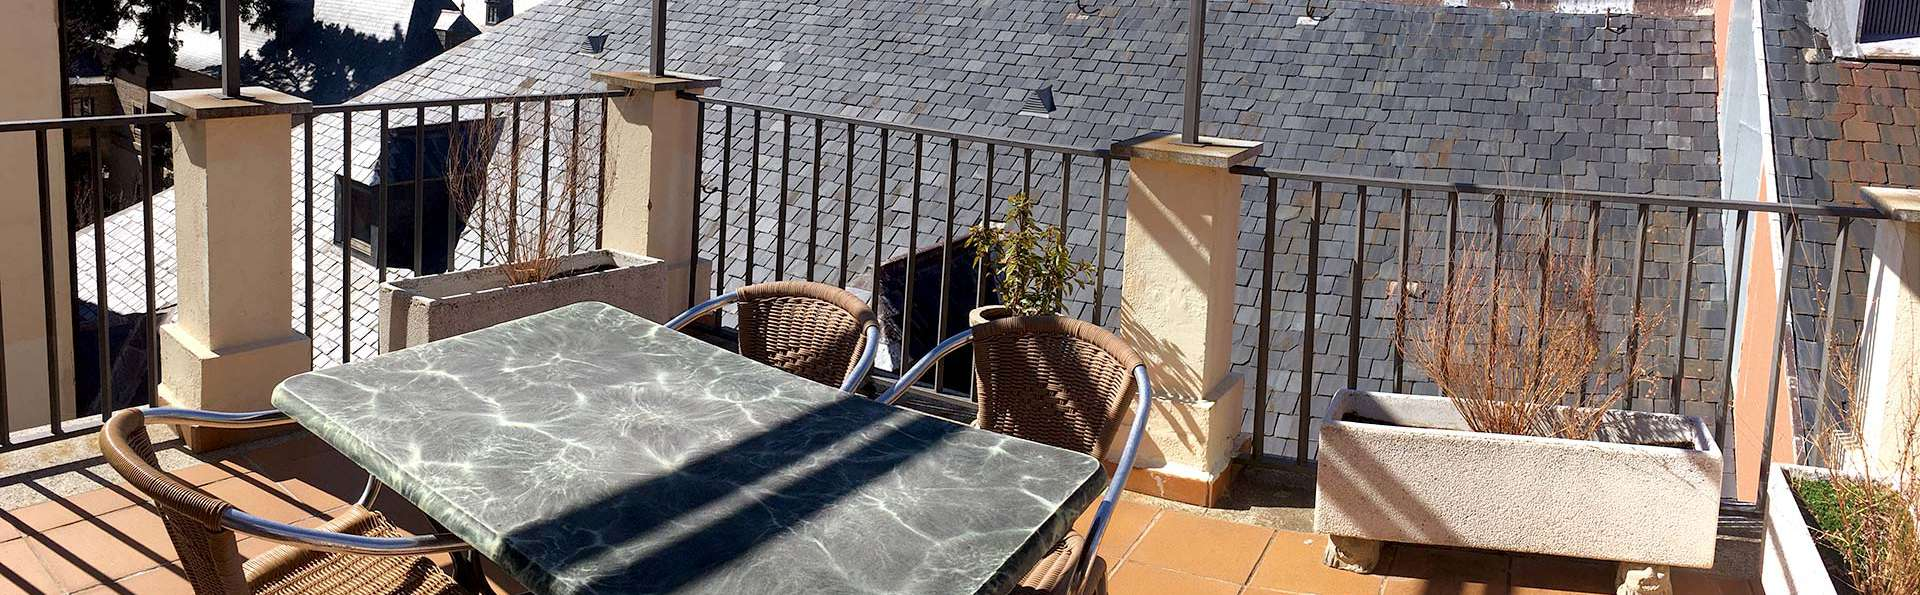 Hotel Miranda & Suizo - Edit_Restaurant4.jpg